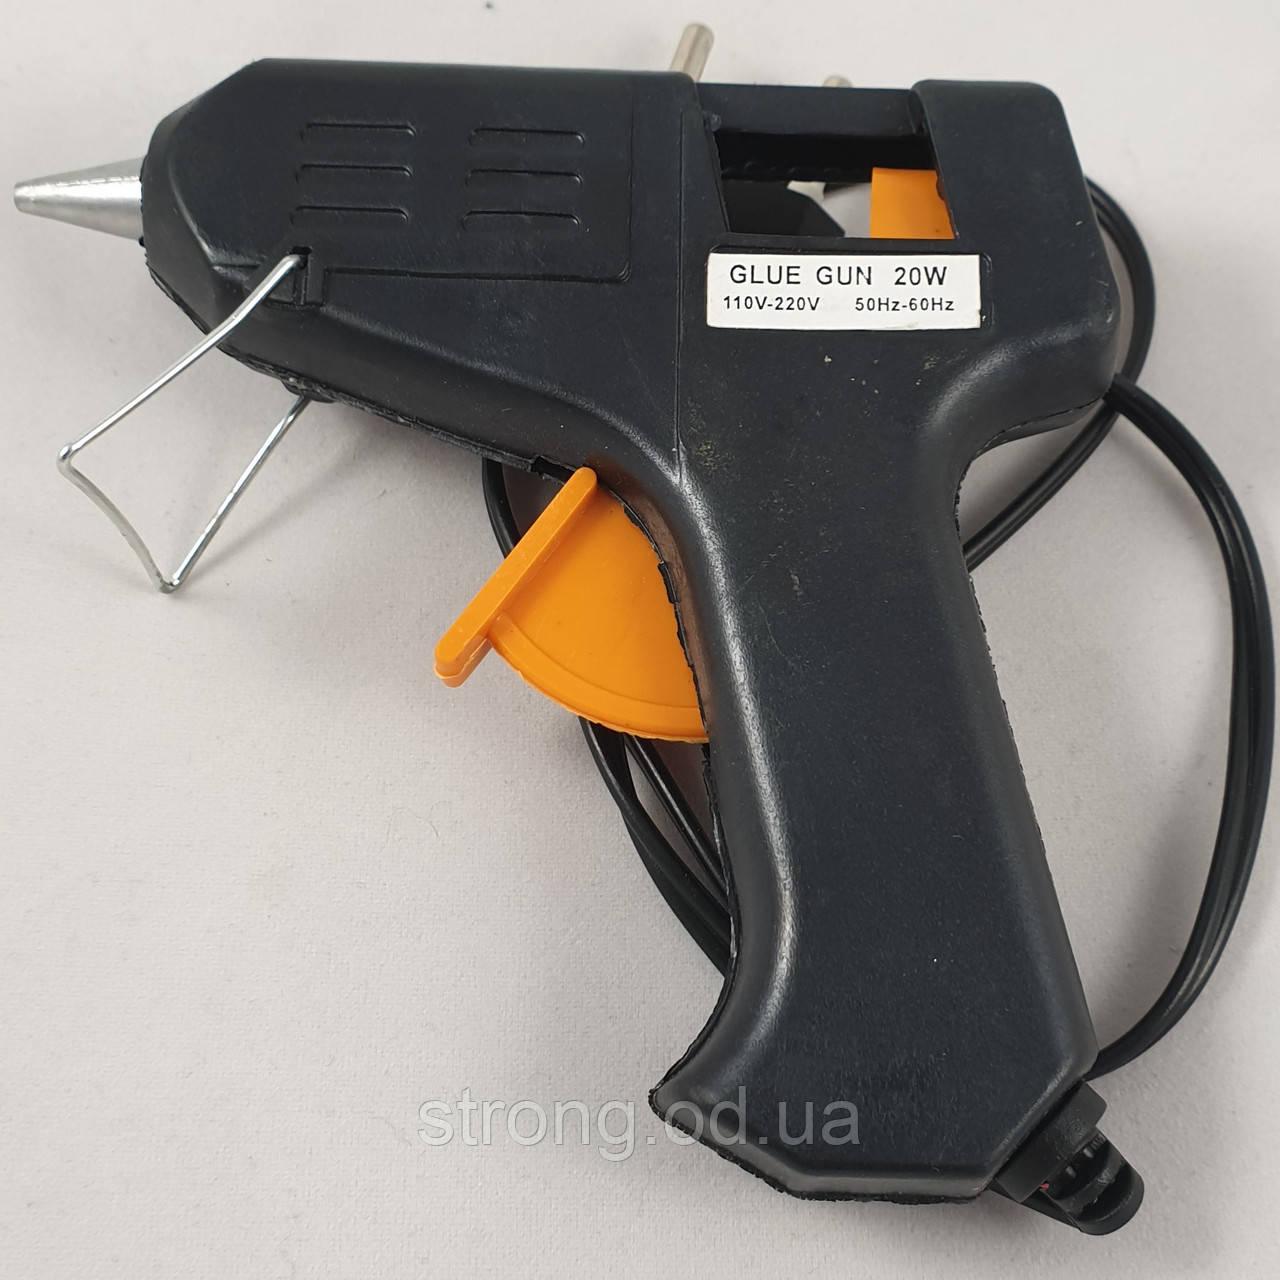 Пистолет Tермоклеевой. 20w стержни 7мм.